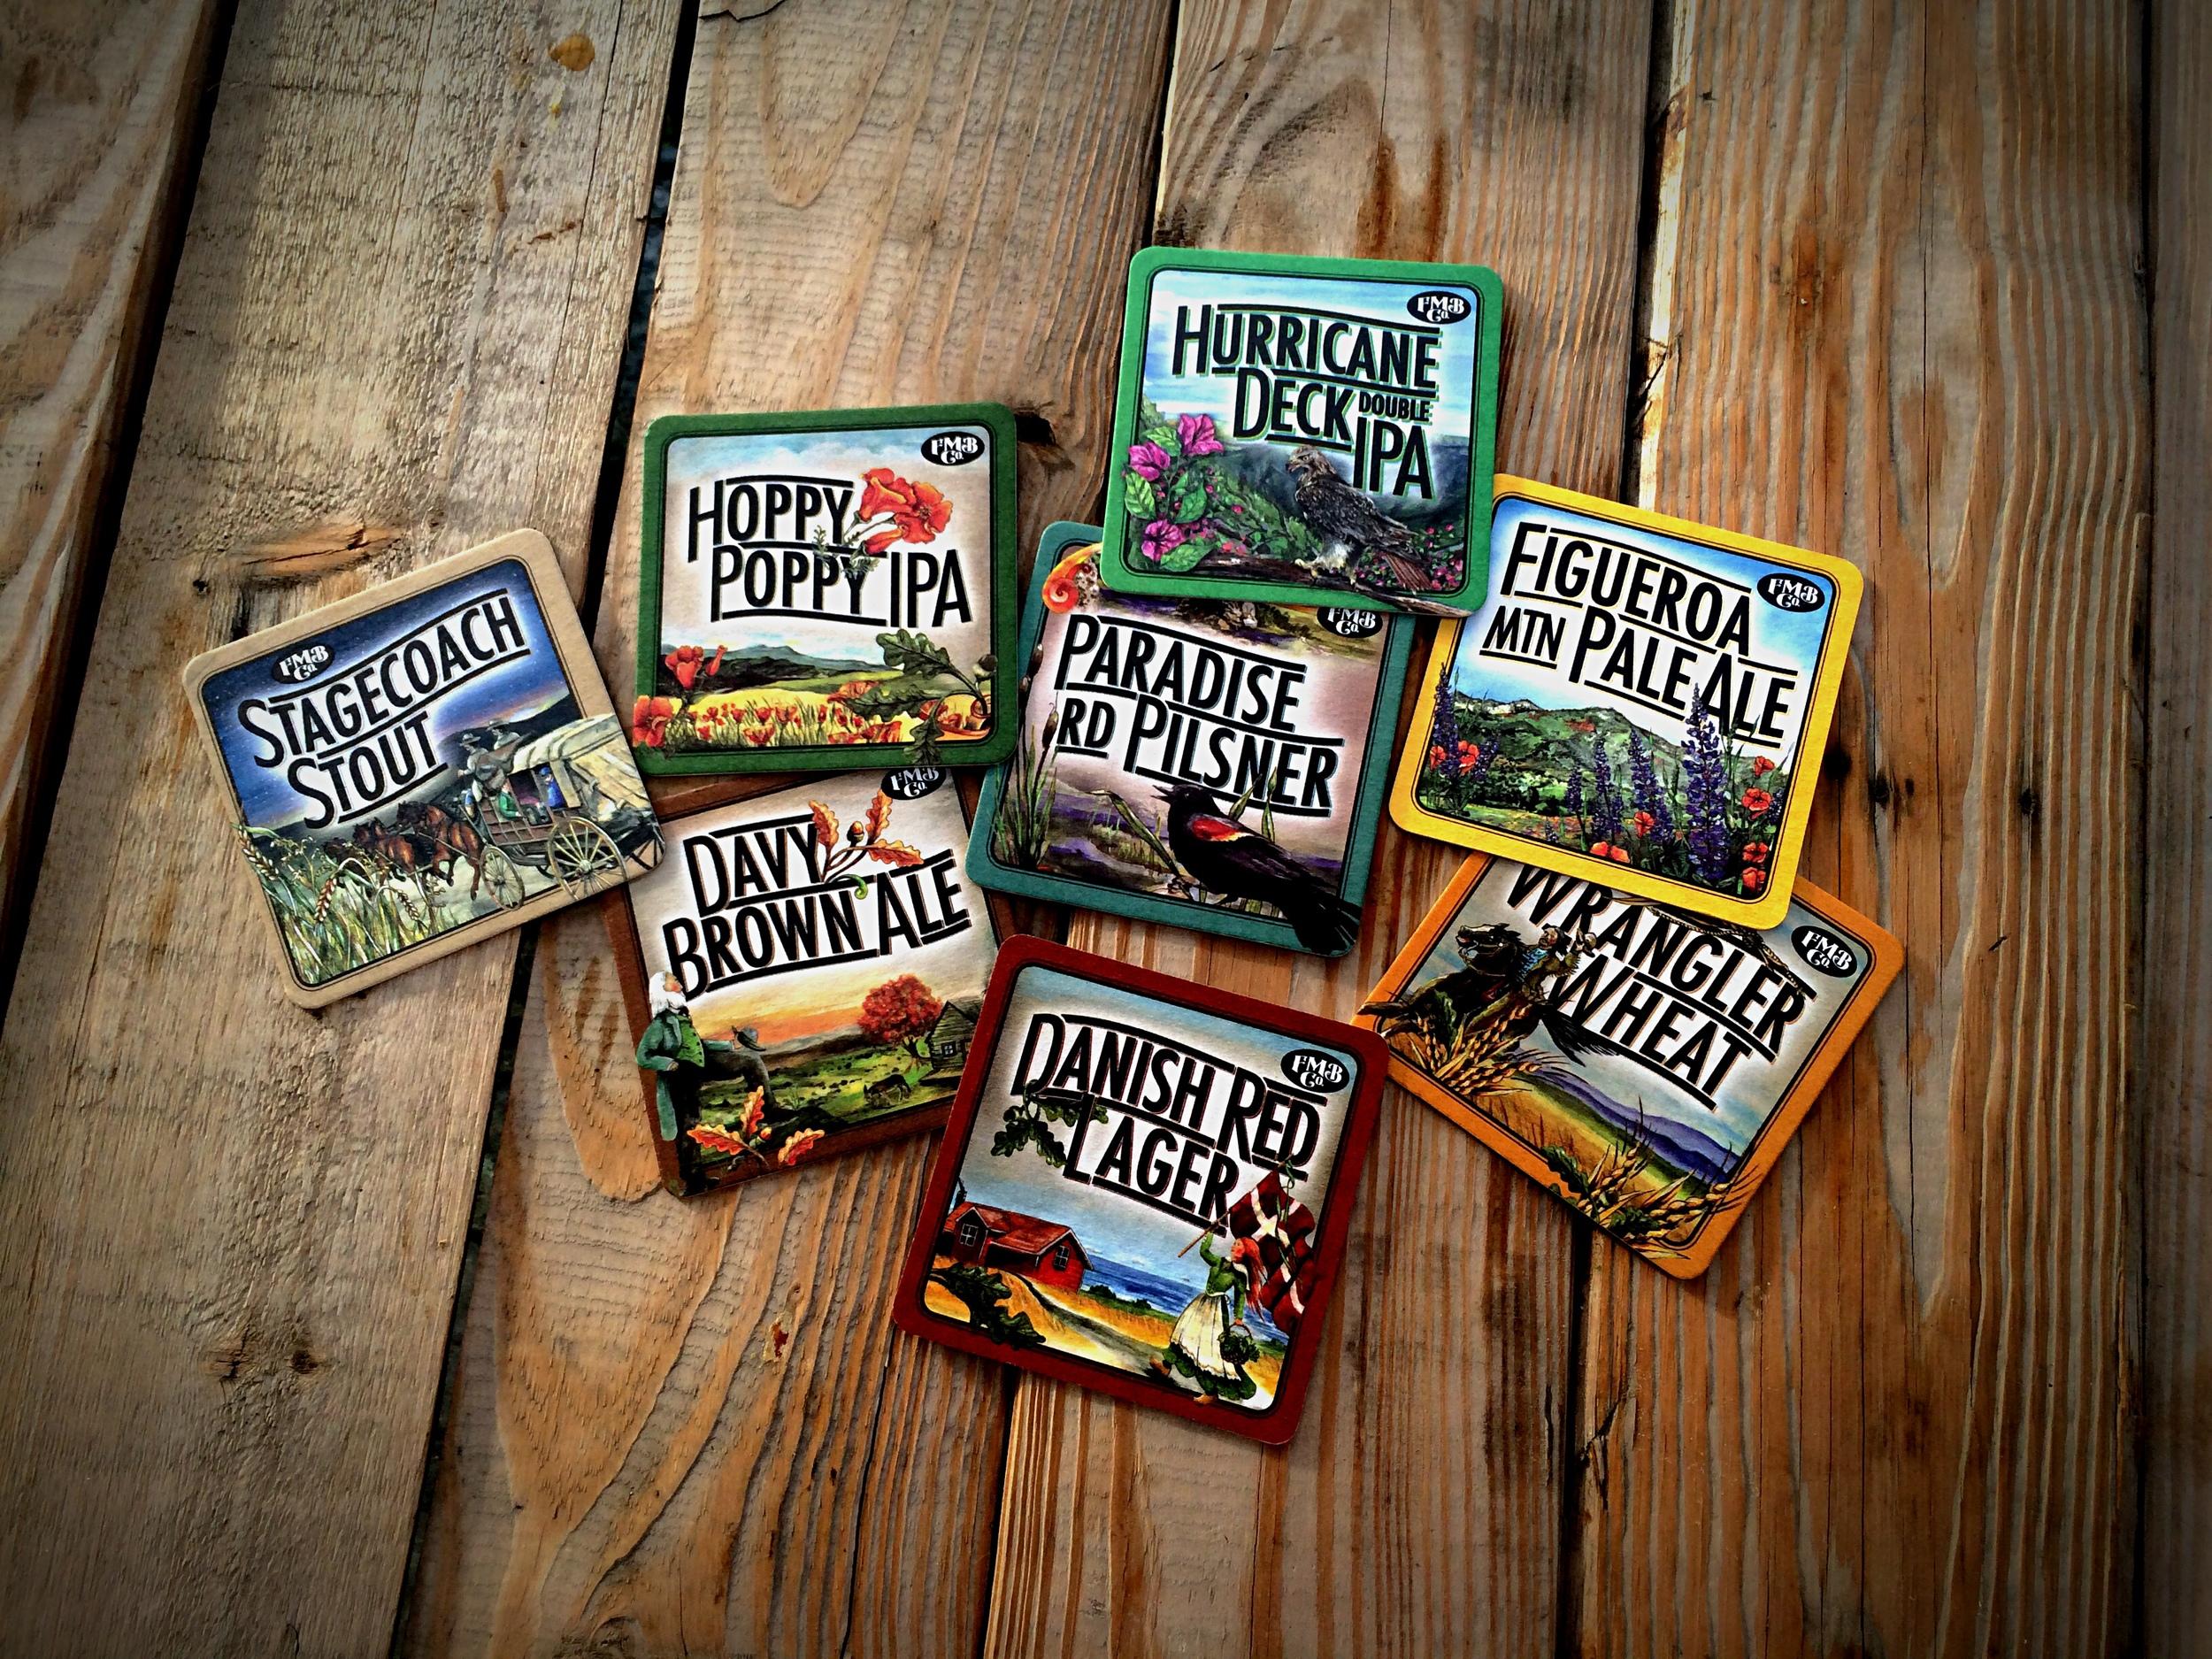 figueroa-mountain-brewing-co-coasters.JPG